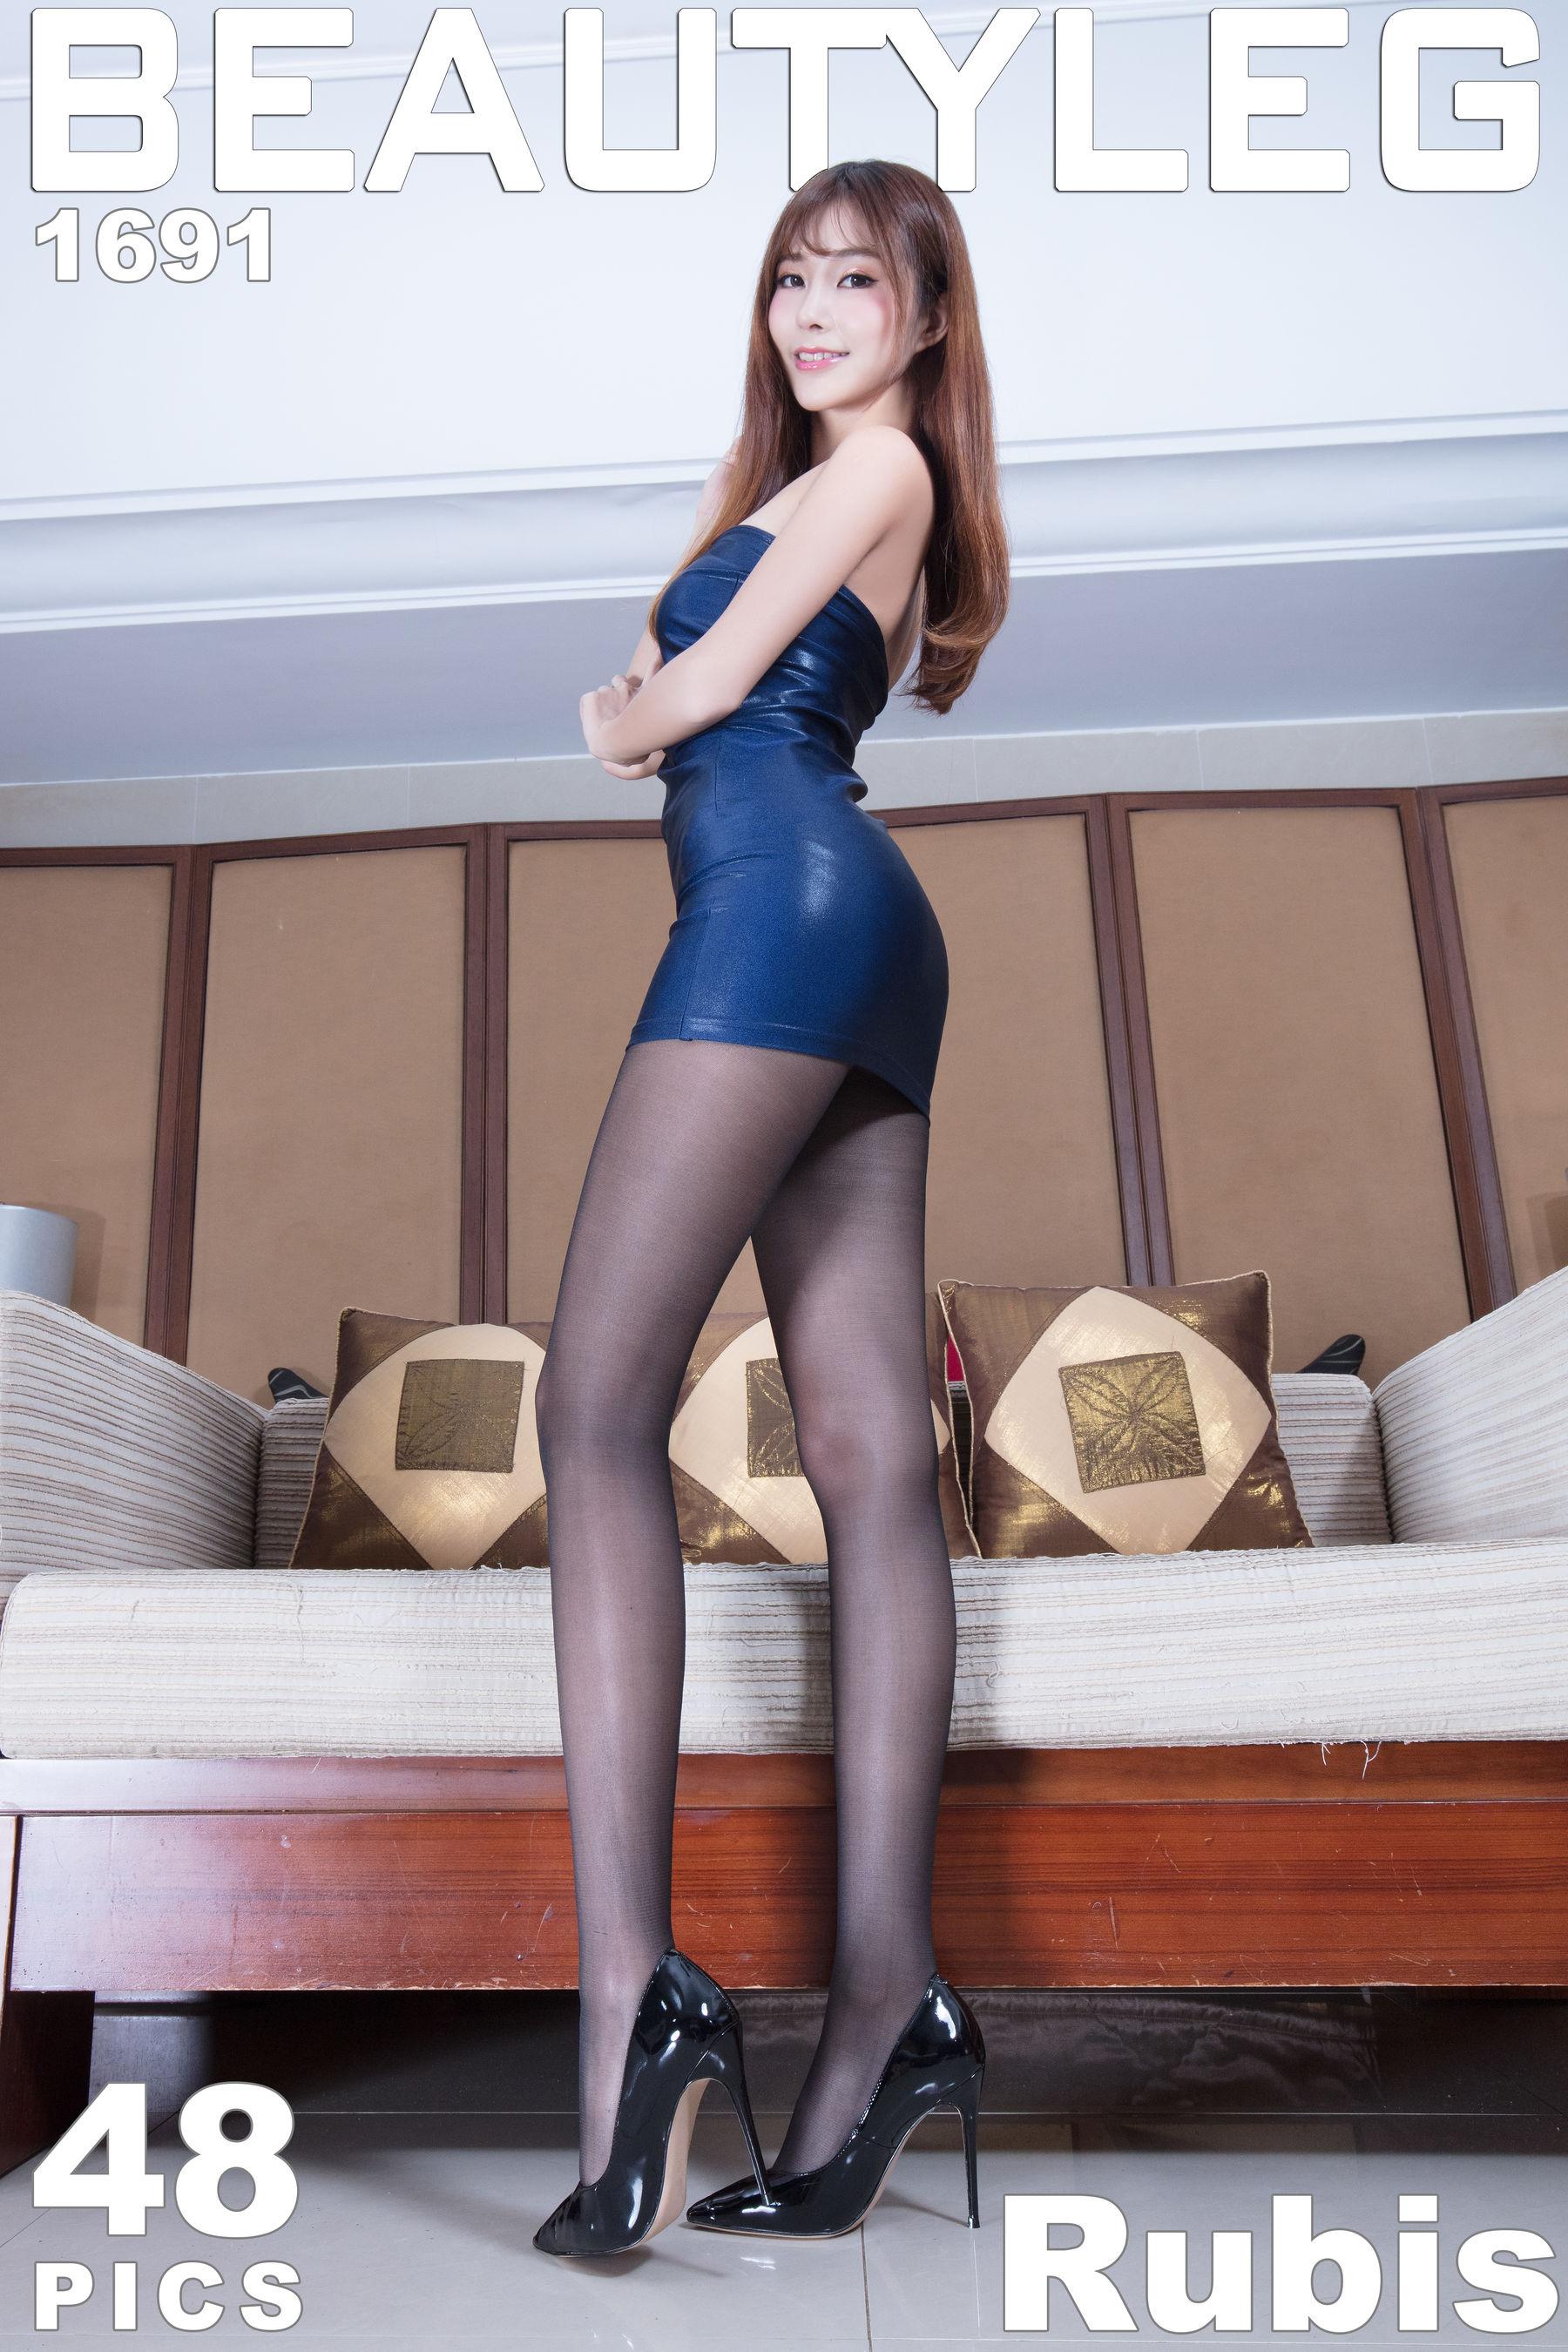 VOL.1275 [Beautyleg]丝袜美腿高跟抹胸:黄上晏(黄上晏Rubis)超高清个人性感漂亮大图(39P)